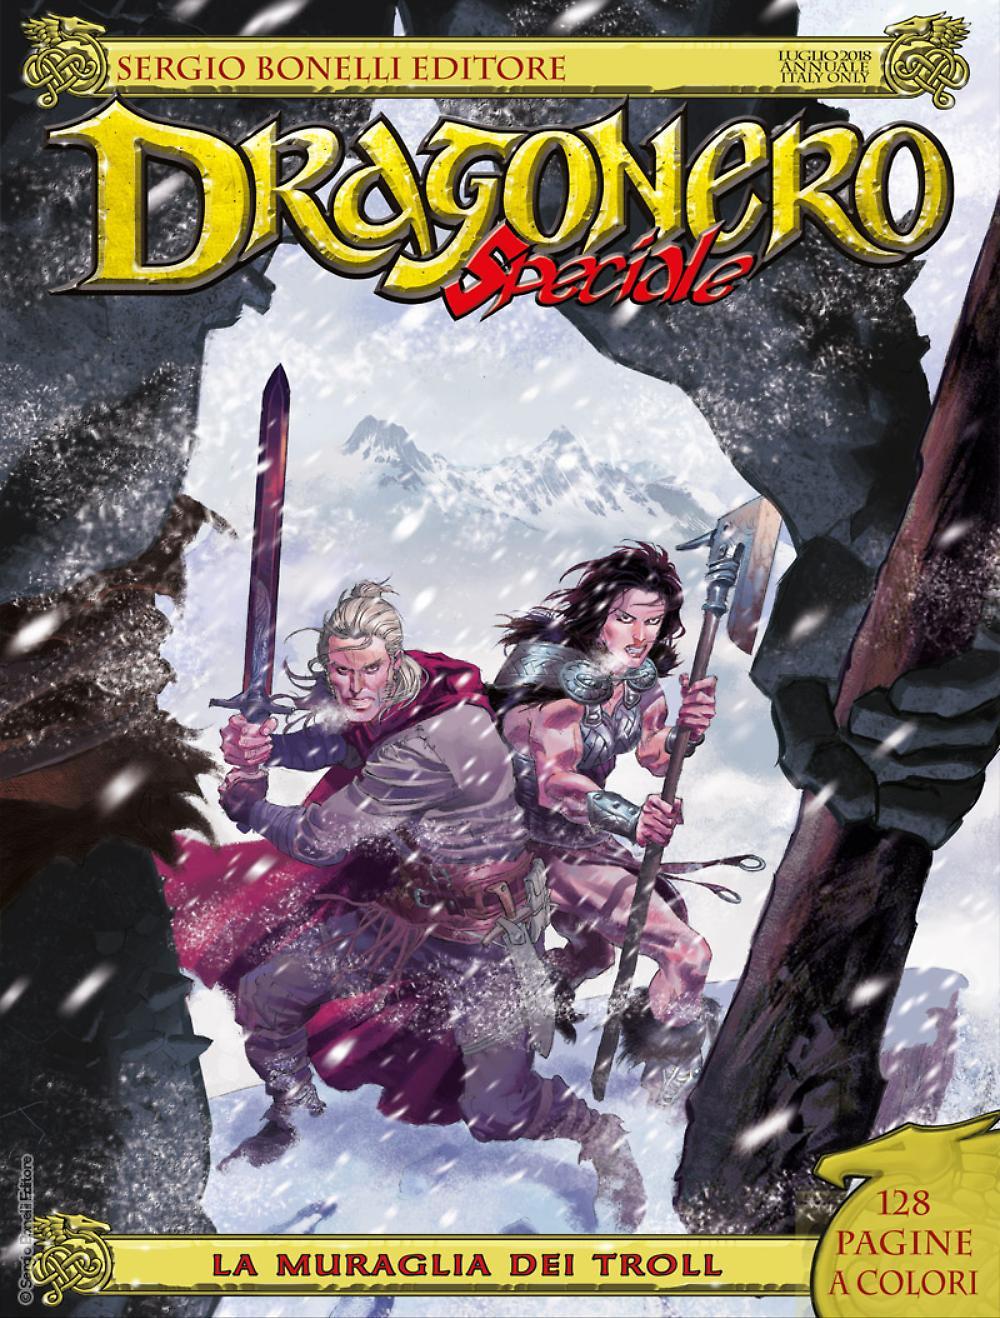 Speciale Dragonero n. 5